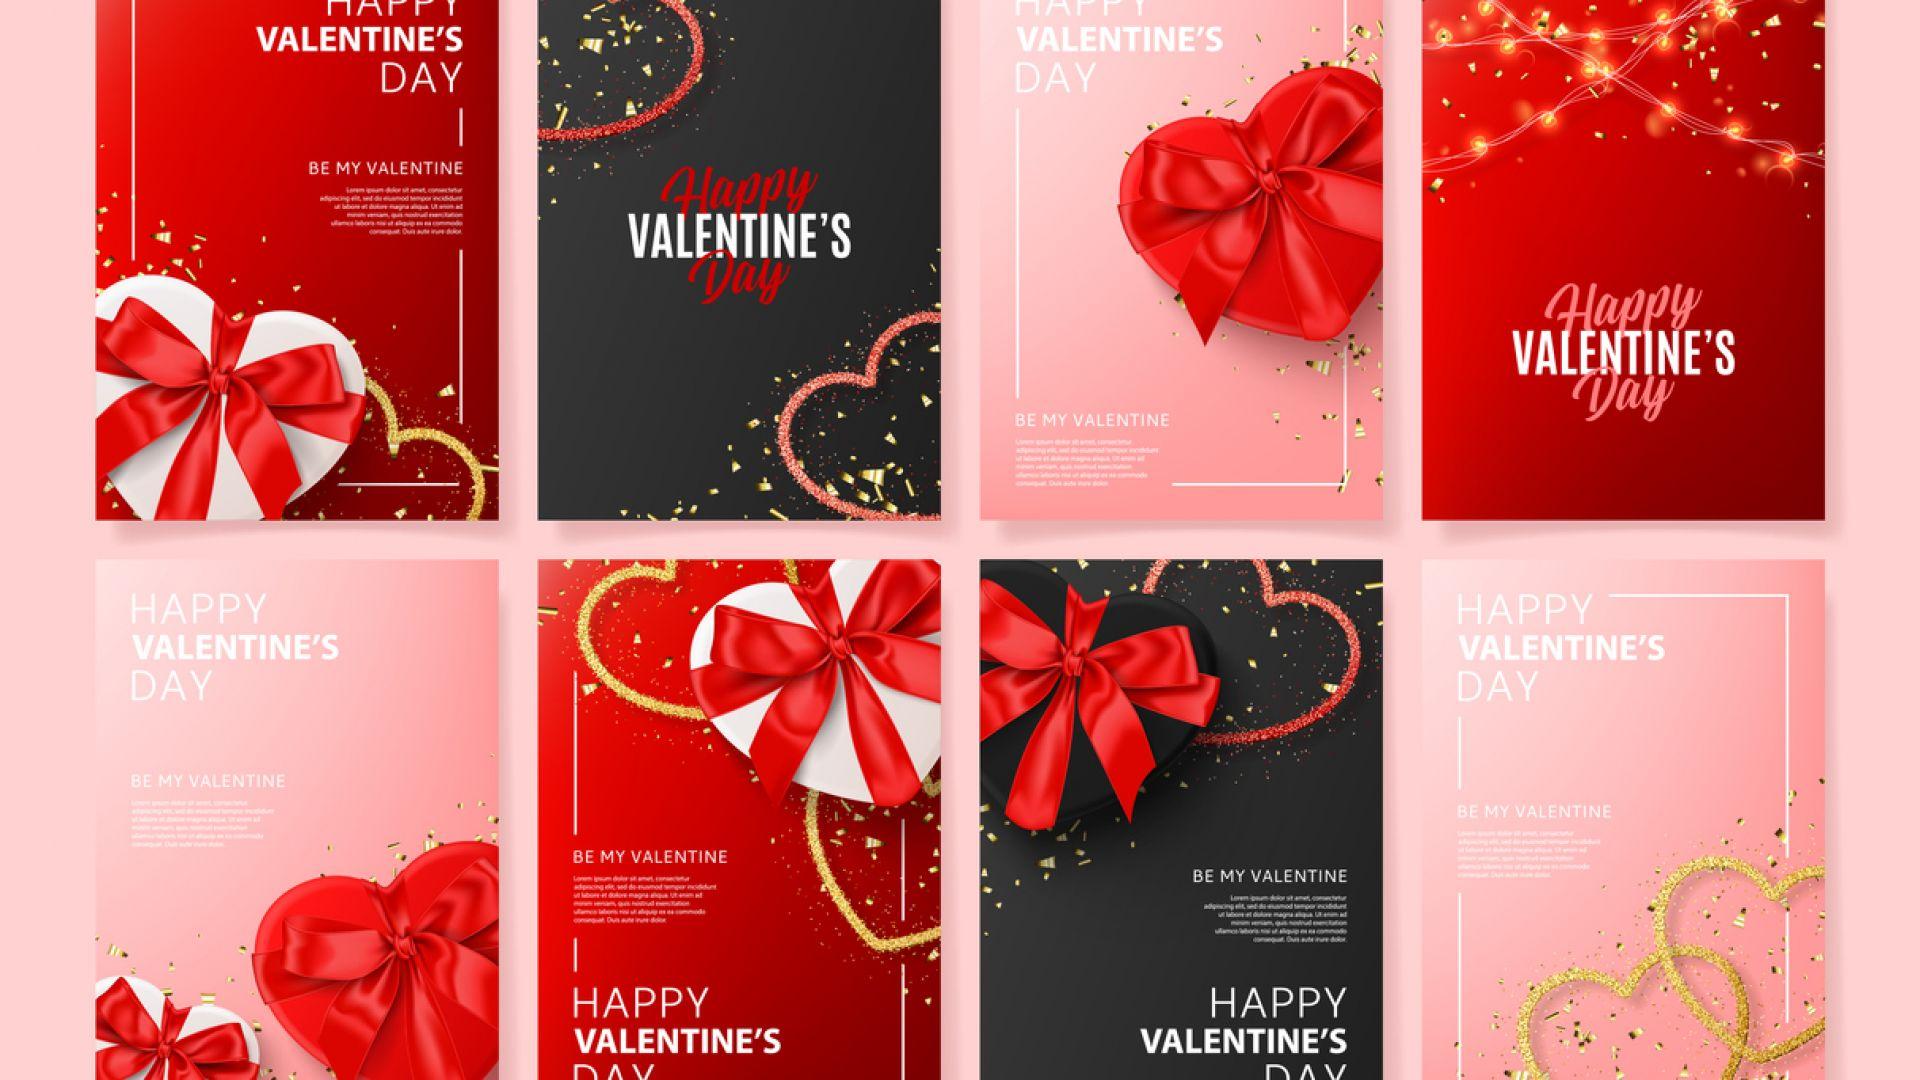 70 000 картички за Св. Валентин получи 104-годишен военен ветеран